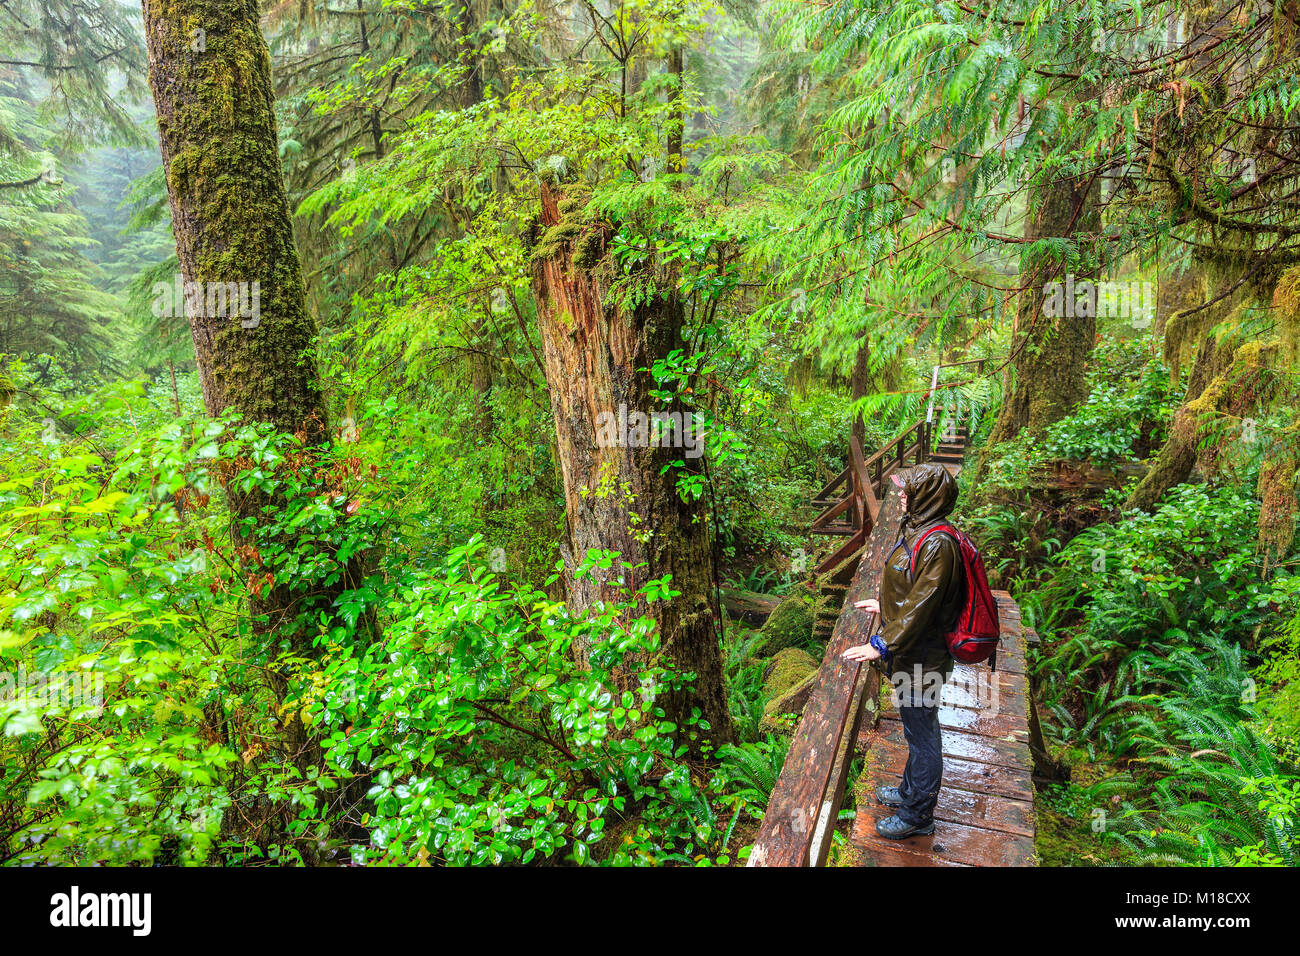 Frau Wandern im Regenwald Trail, Pacific Rim National Park, Vancouver Island, British Columbia, Kanada. Stockbild